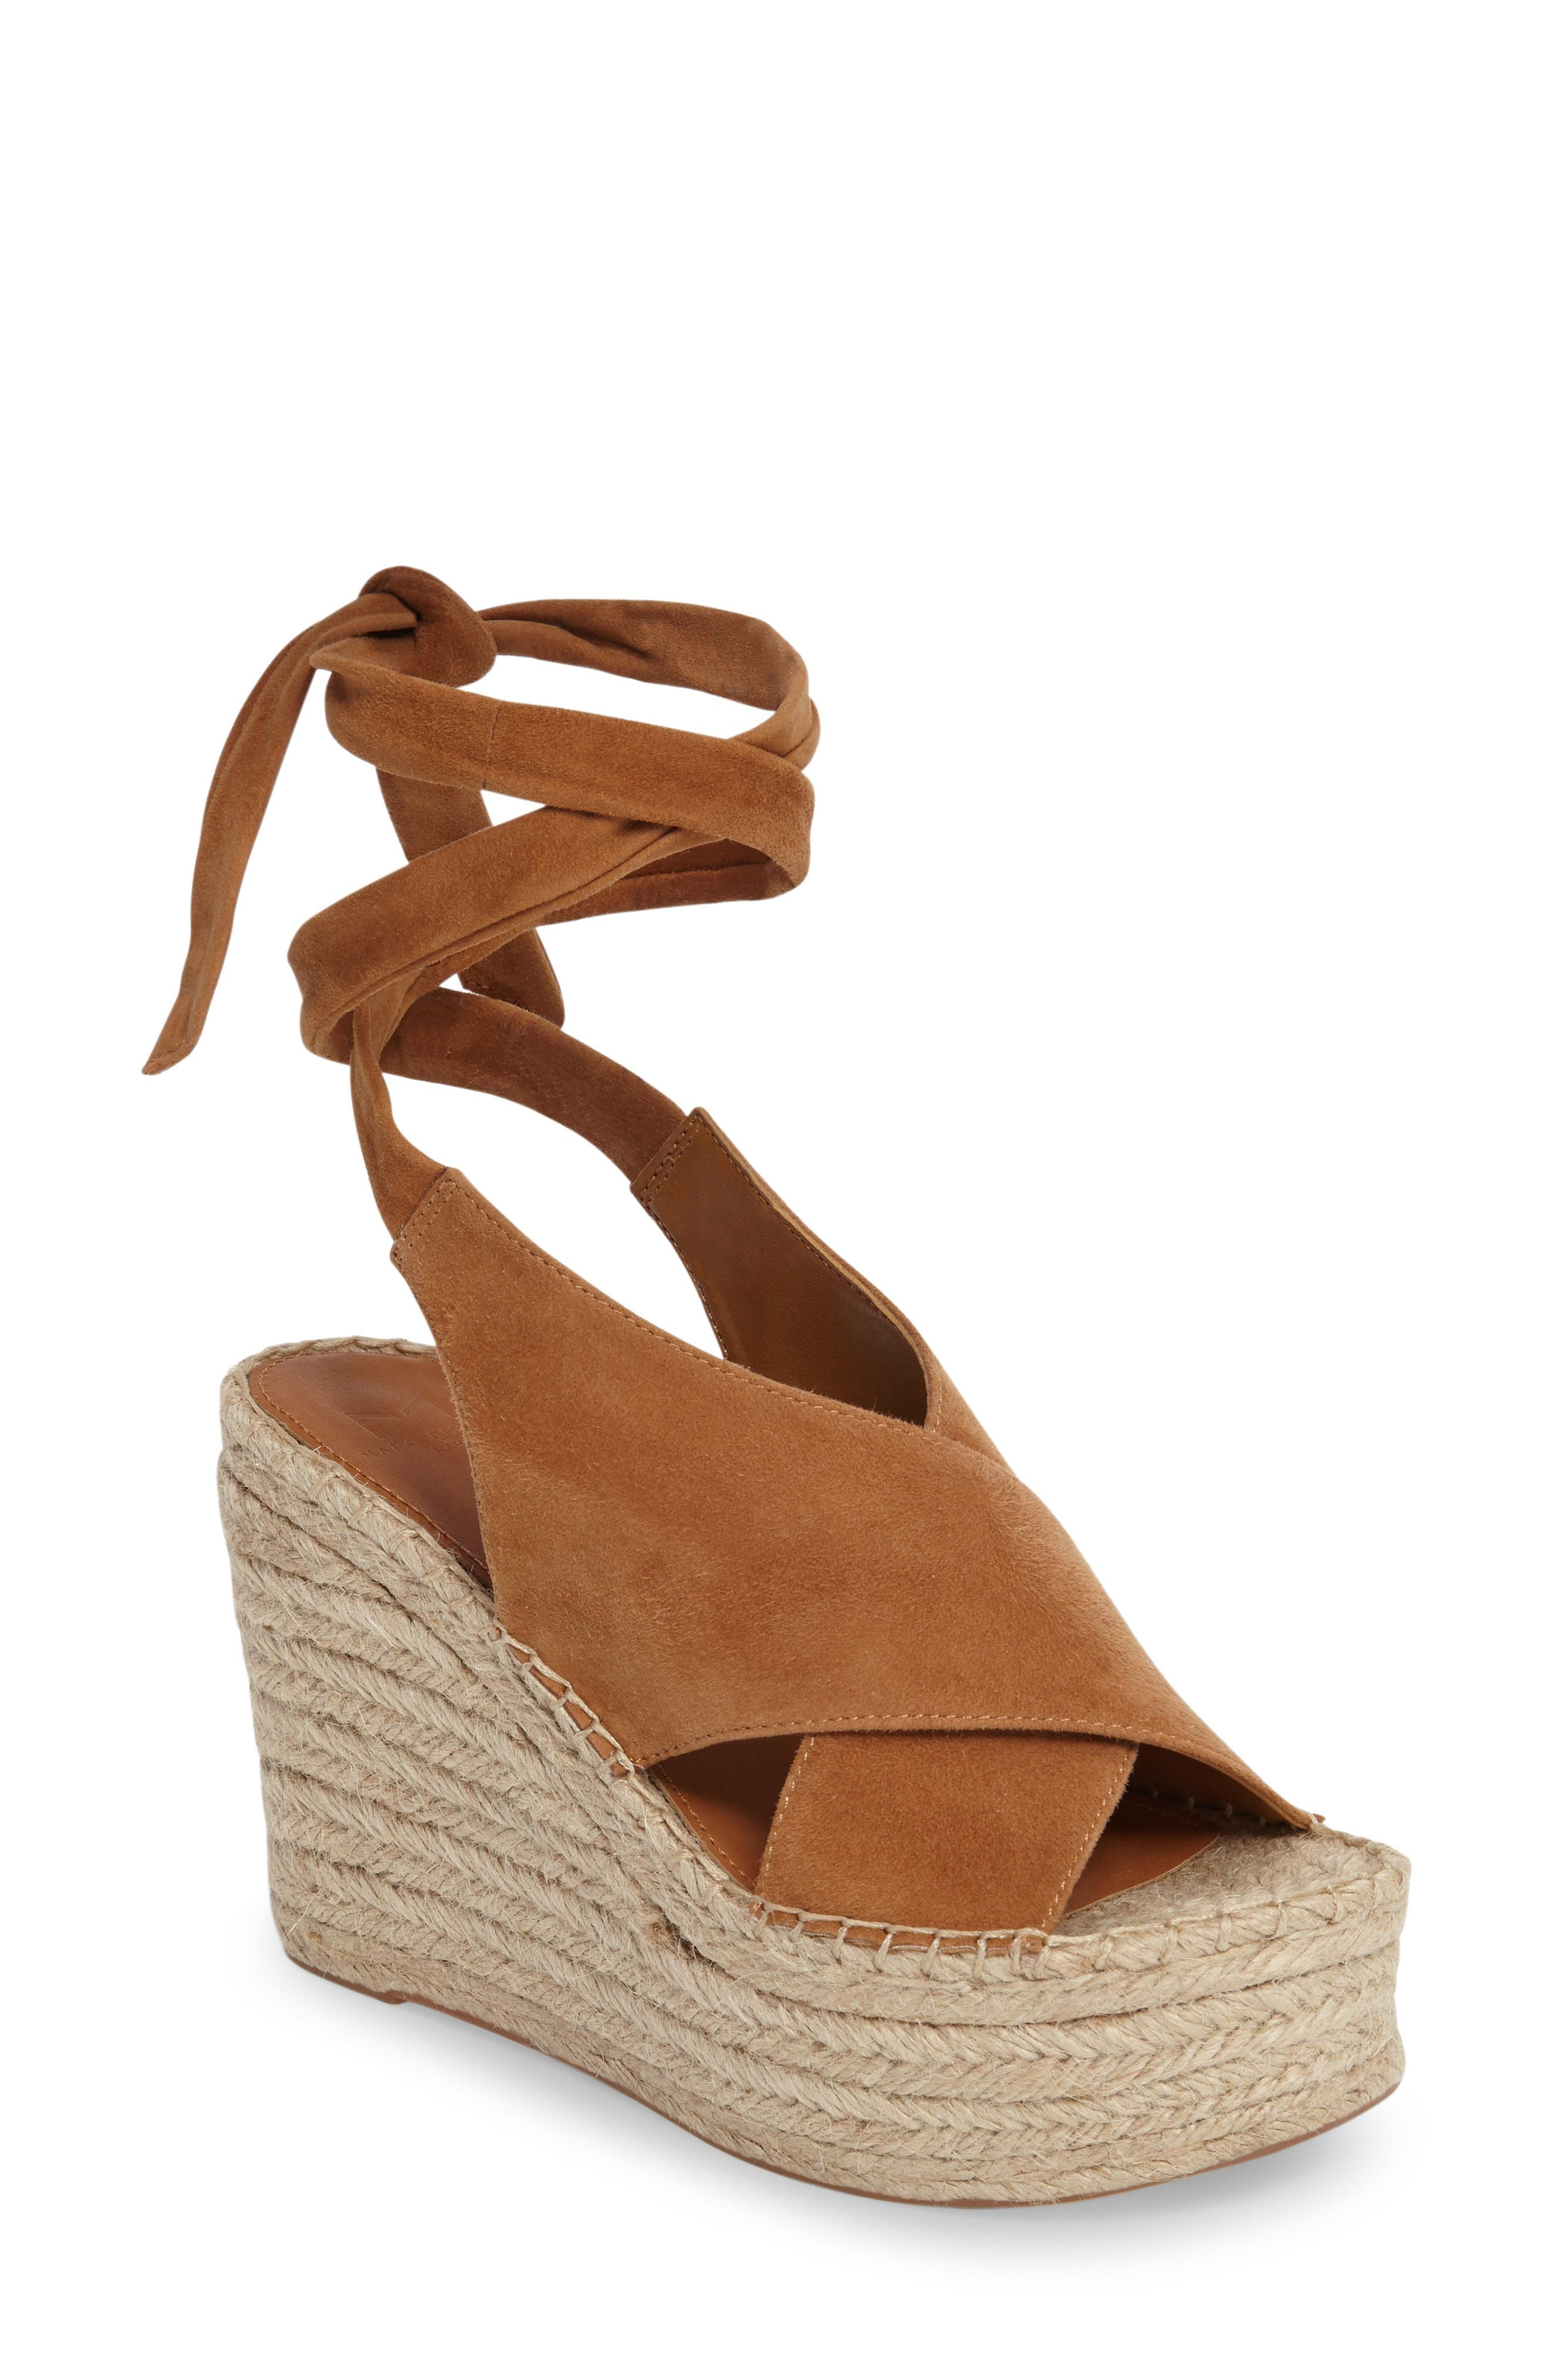 Alternate Image 1 Selected - Marc Fisher LTD Andira Platform Wedge Sandal (Women)